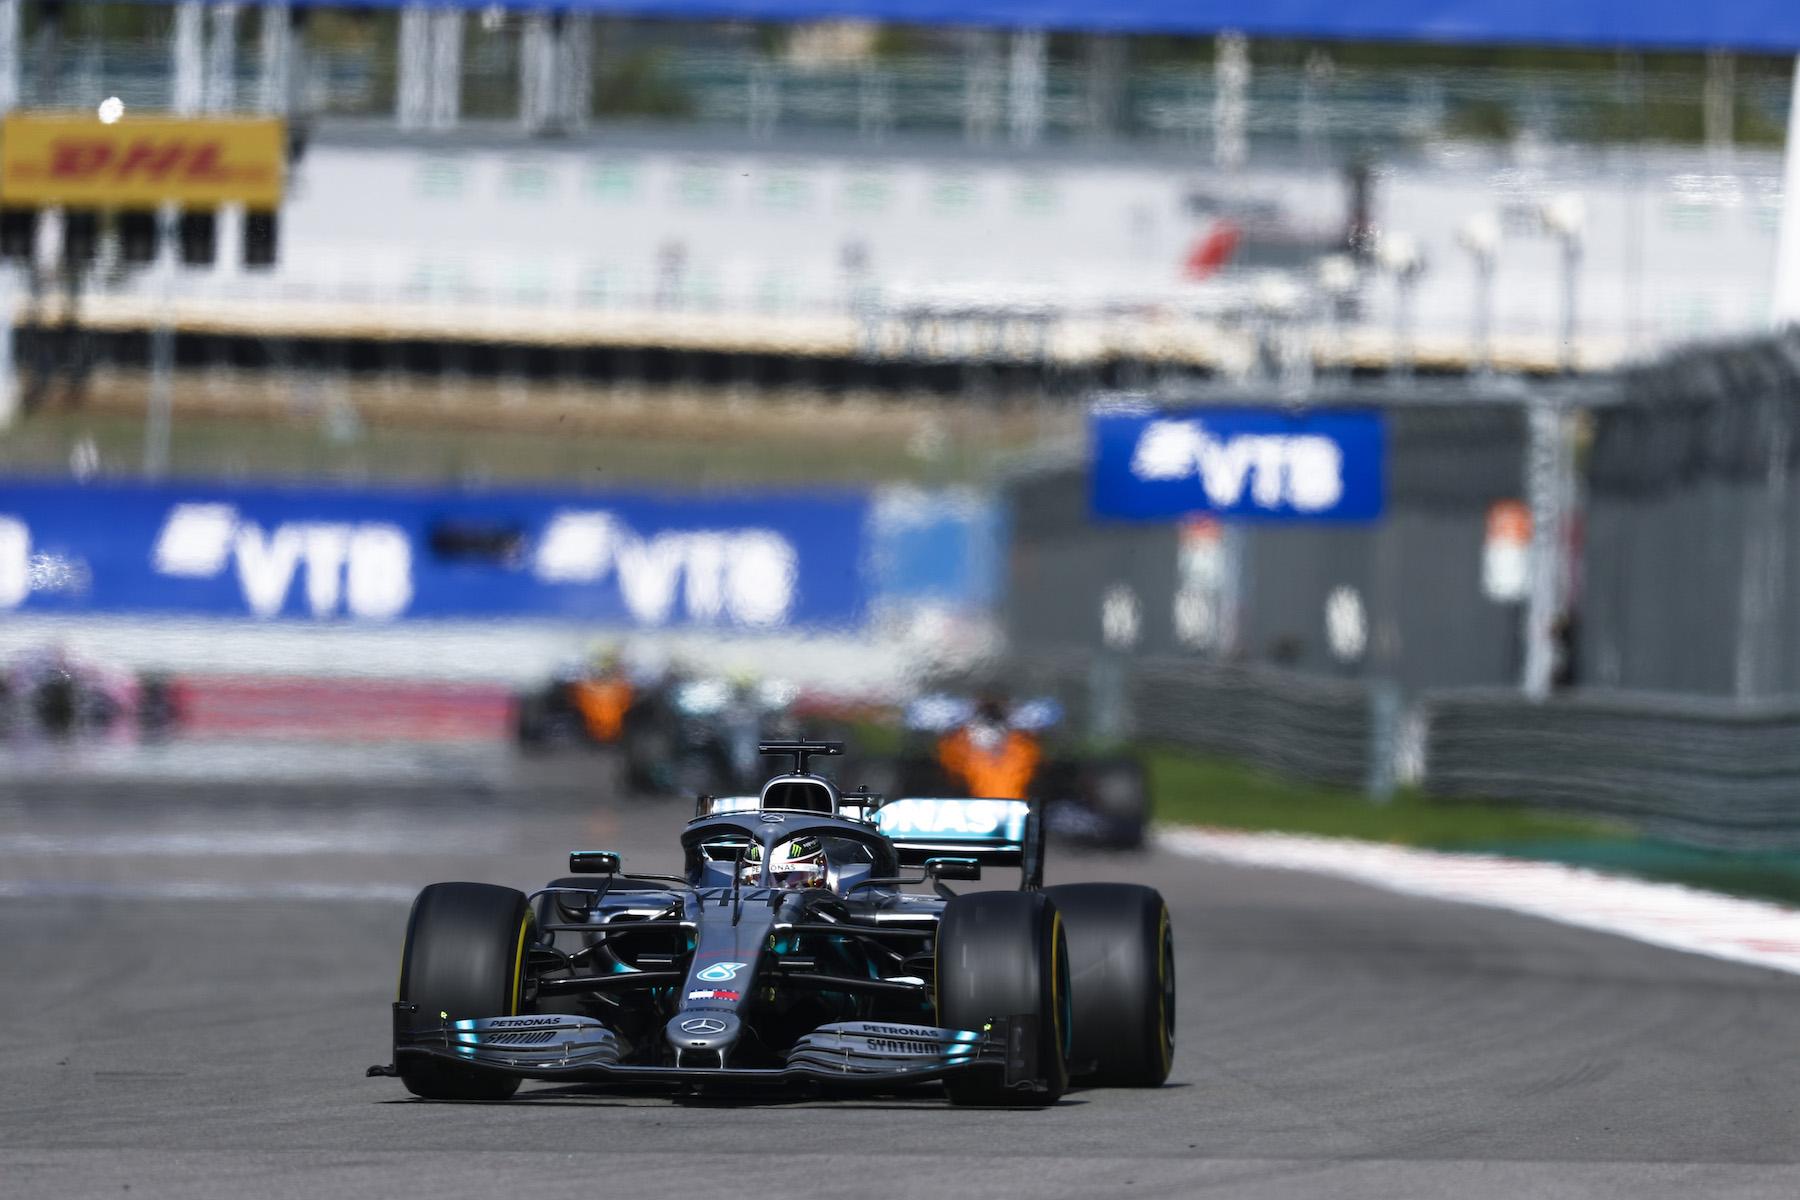 4 2019 Russian GP Sunday 23.jpg